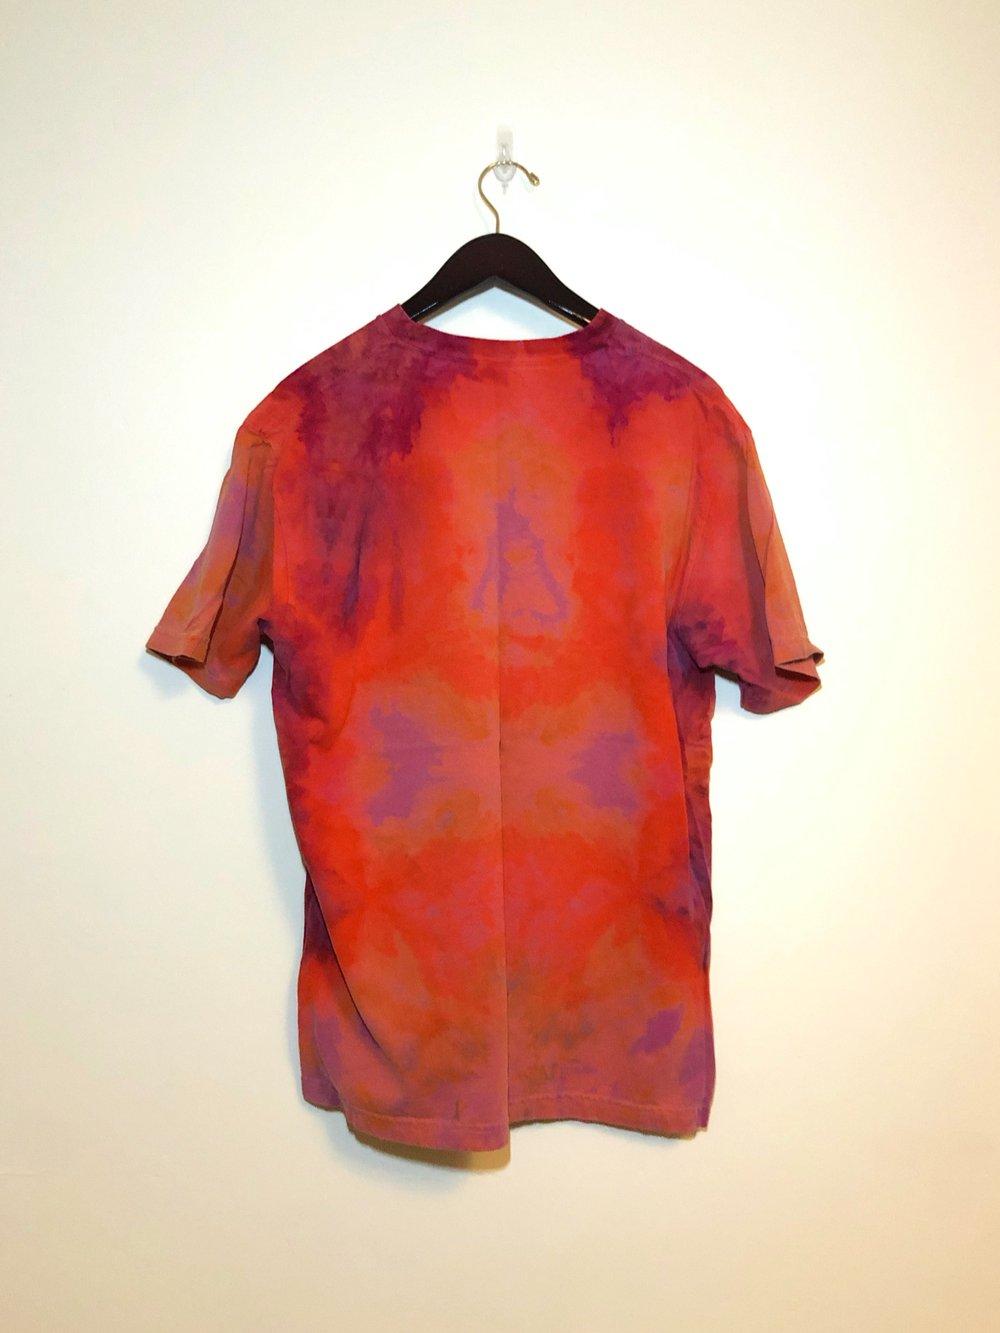 Shirt #20 - Medium